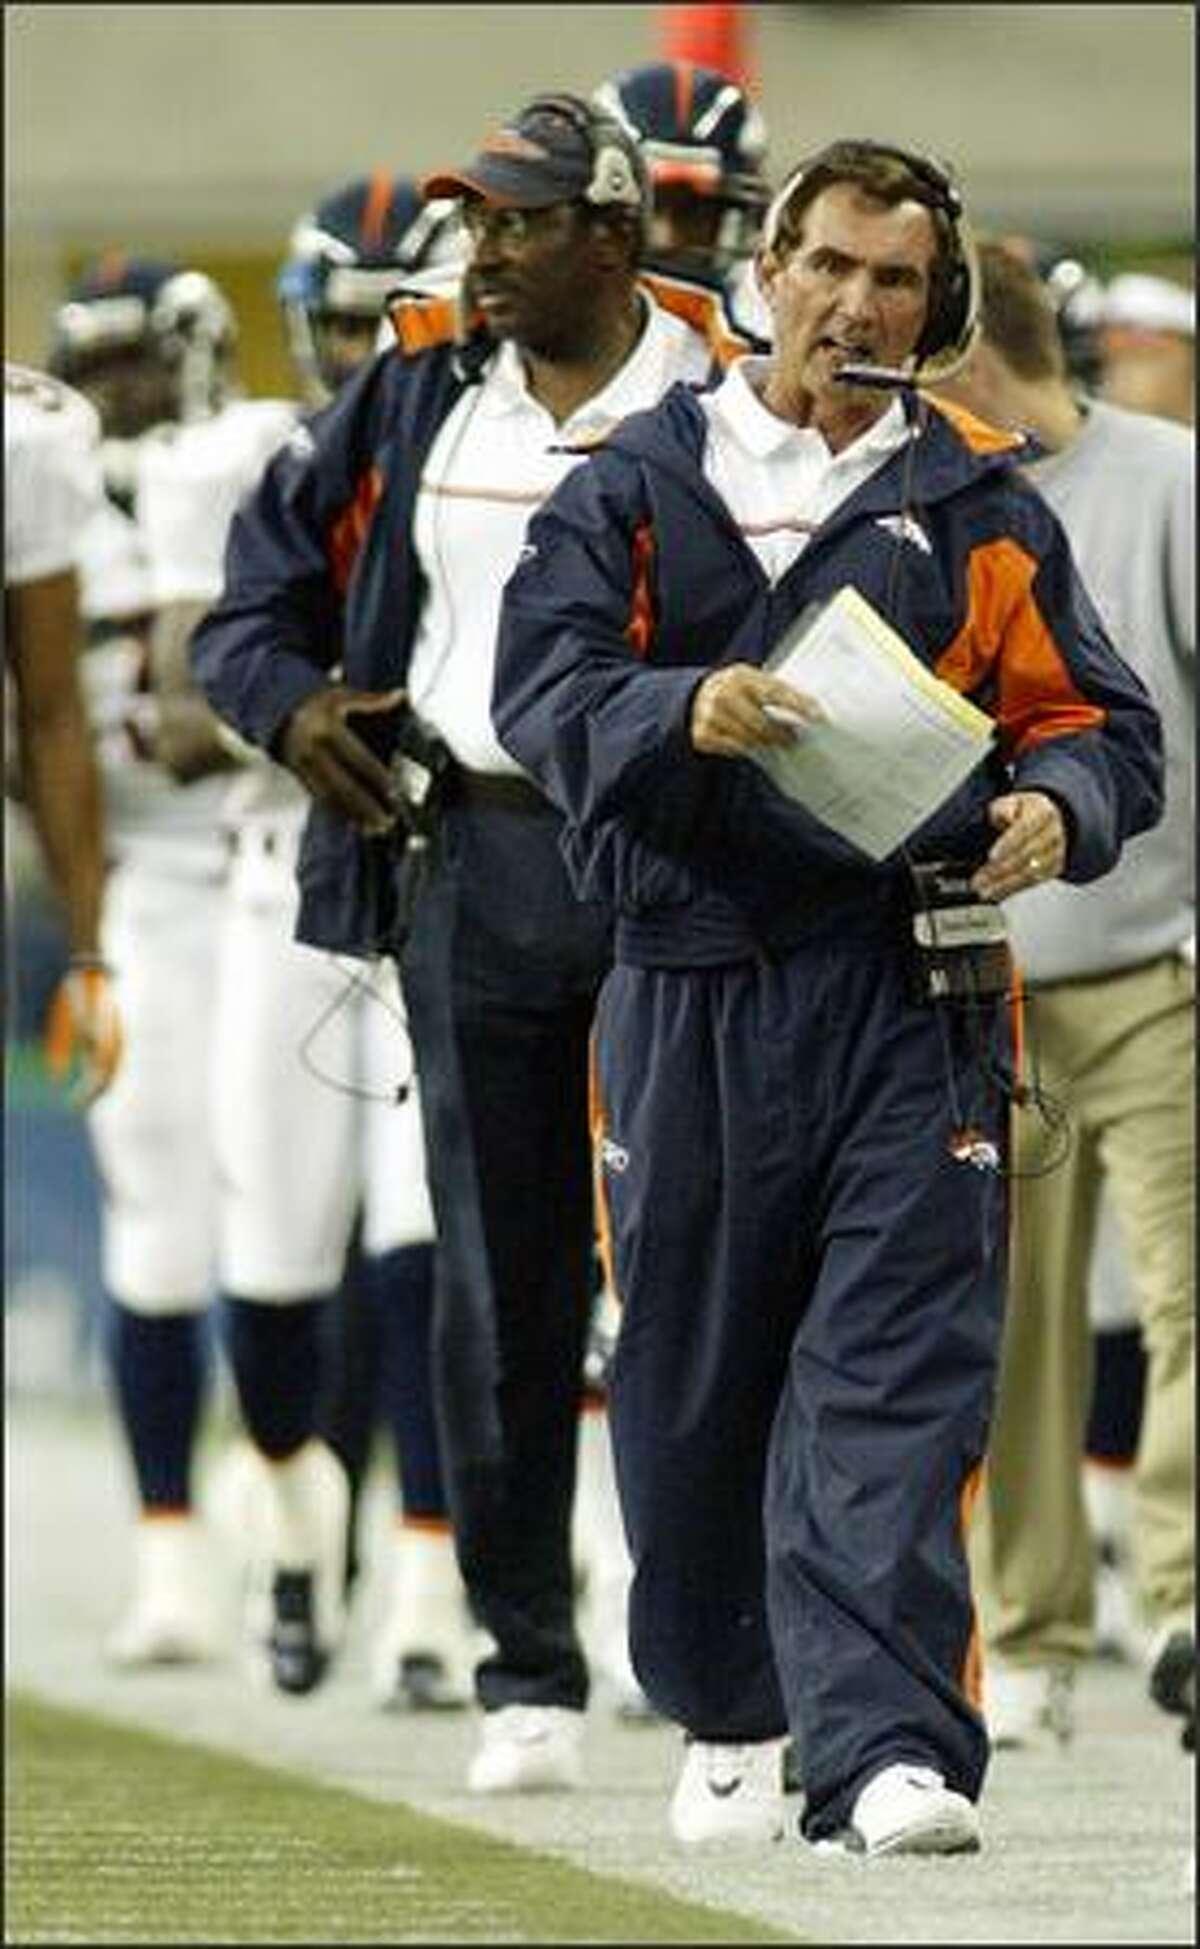 Denver Broncos' coach Mike Shanahan walks the sideline in the second quarter. (AP Photo/Ted S. Warren)